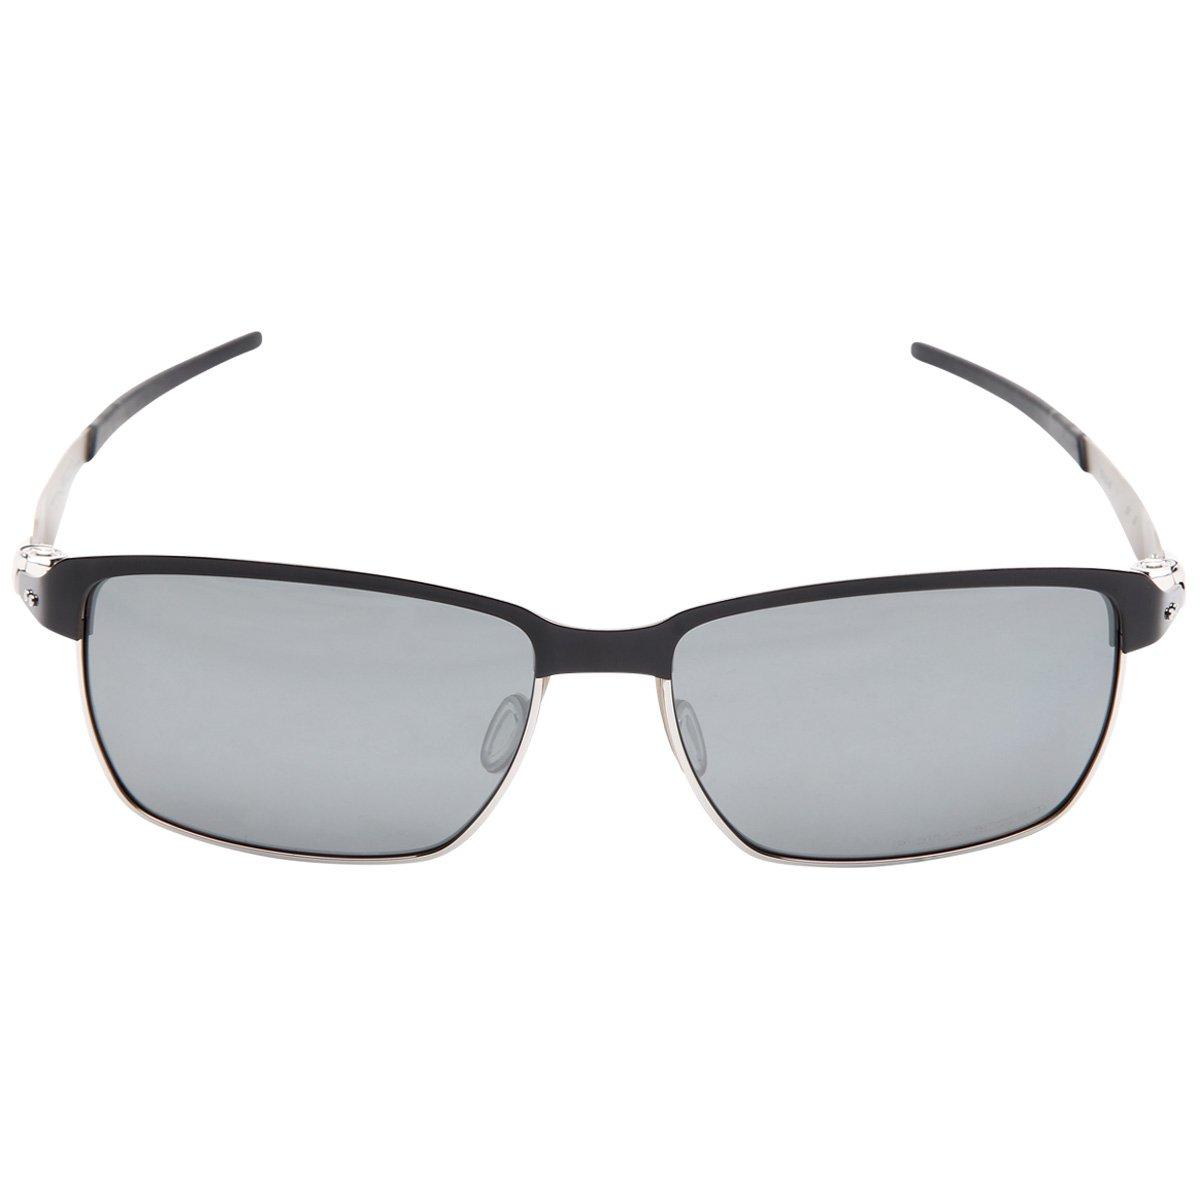 Óculos de Sol Oakley Tinfoil Iridium - Compre Agora   Netshoes 1b01b35558